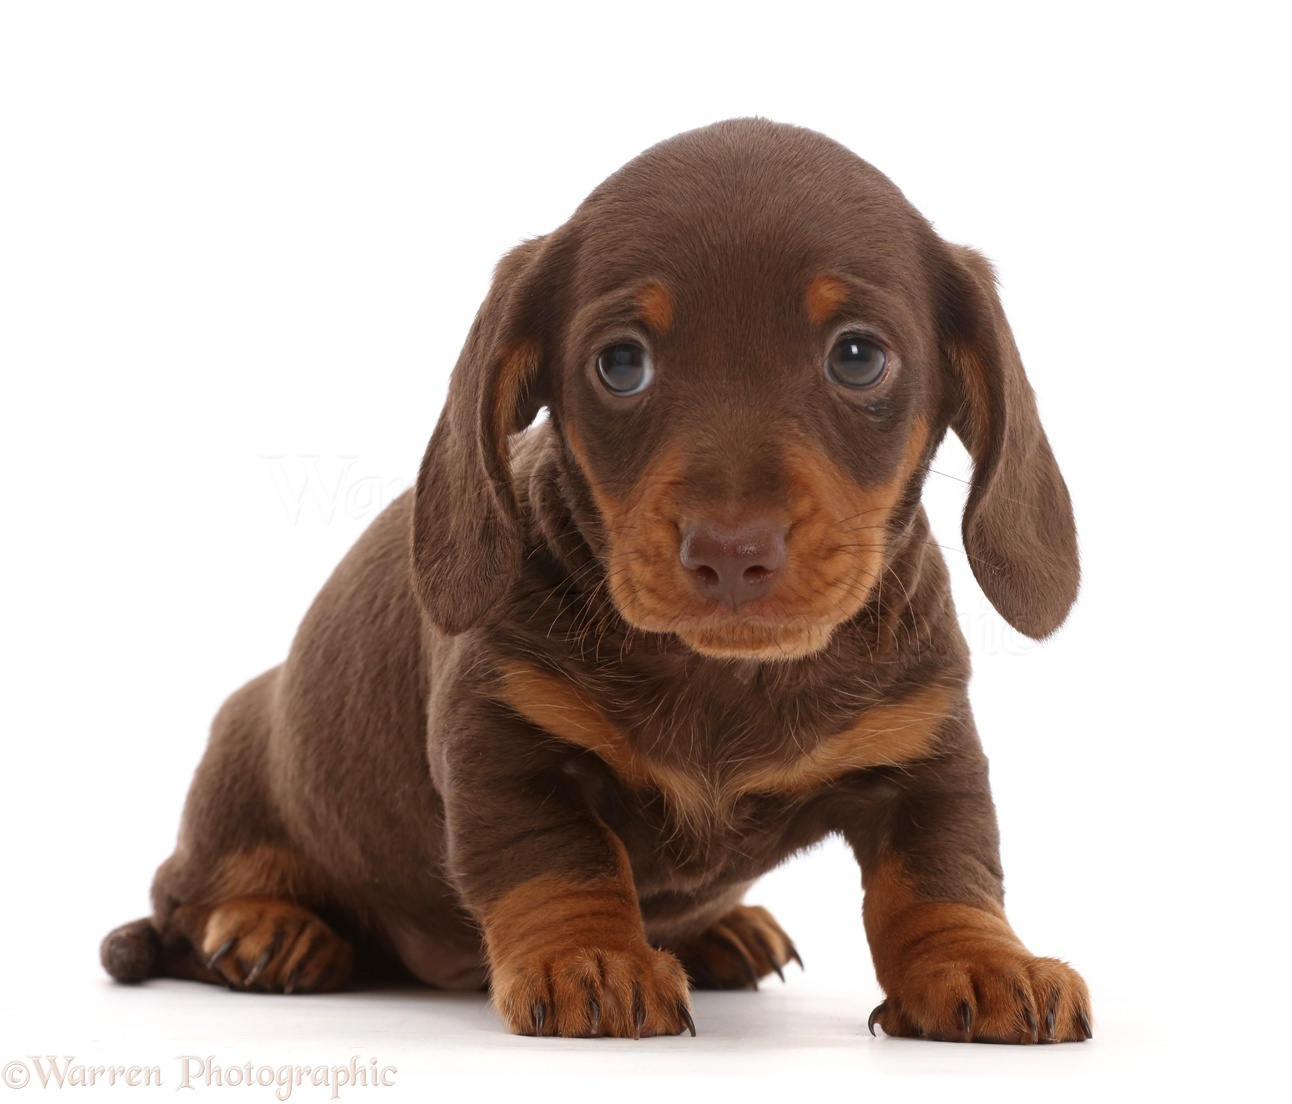 Dog Chocolate Dachshund Puppy Photo Wp46022